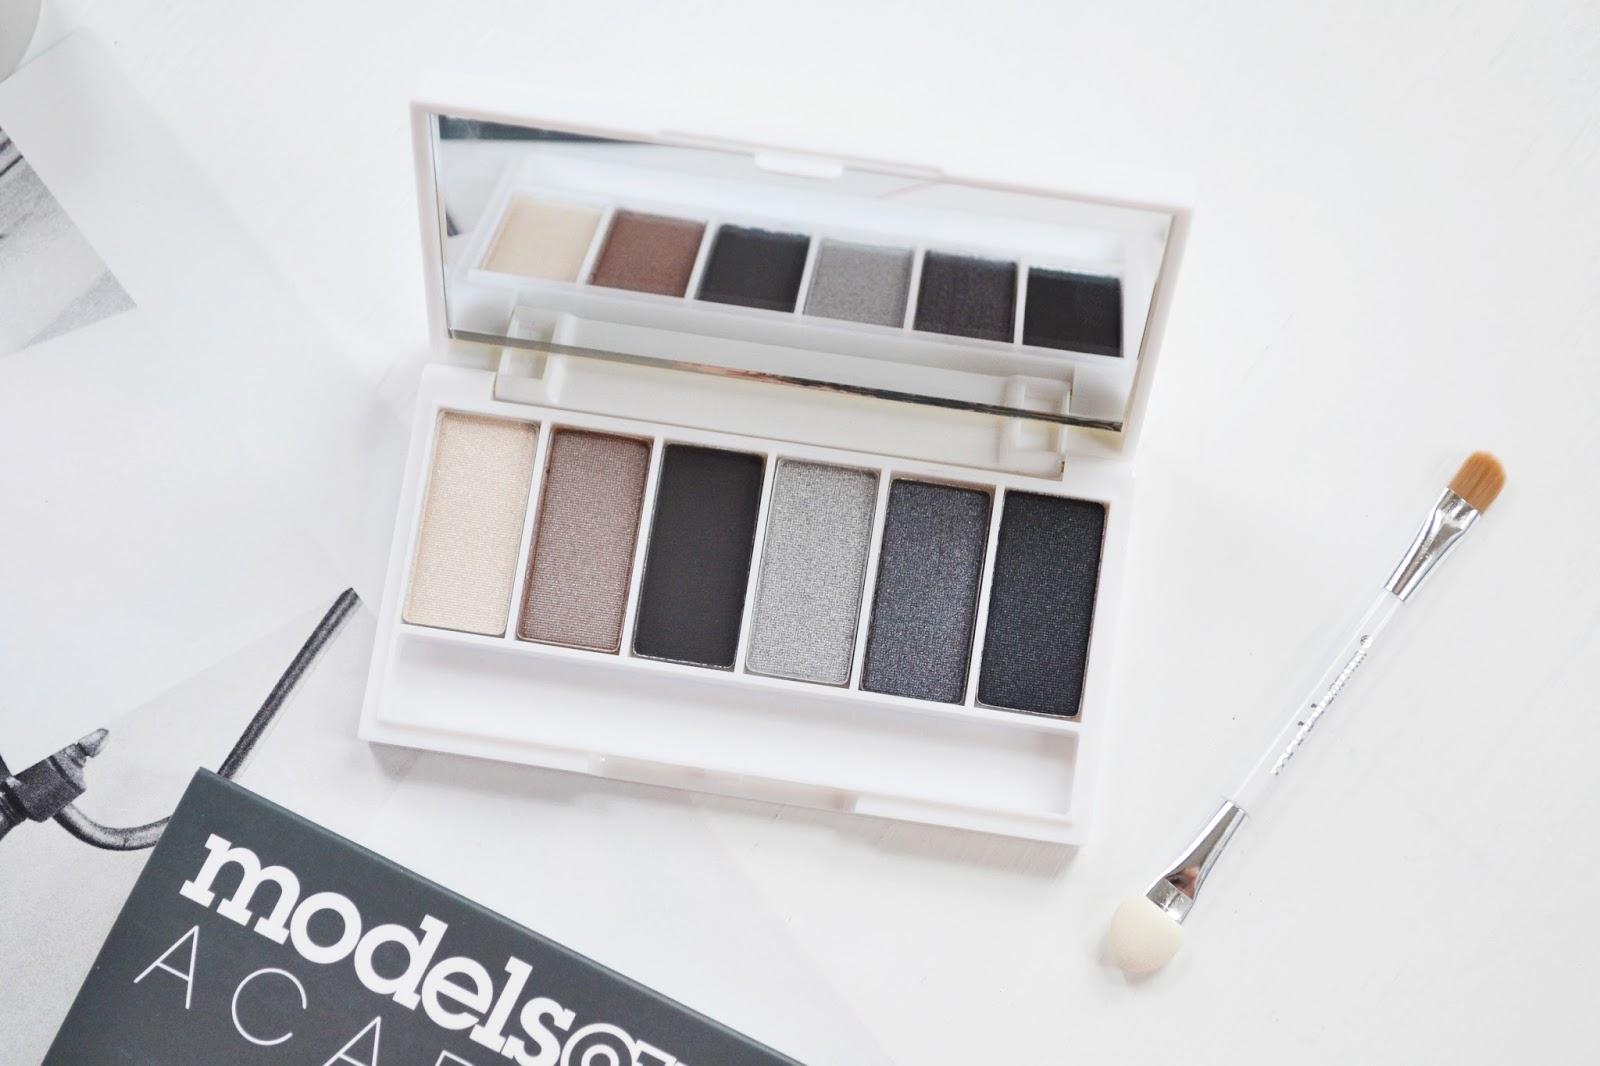 Affordable Smokey Eyeshadow Palette Kit